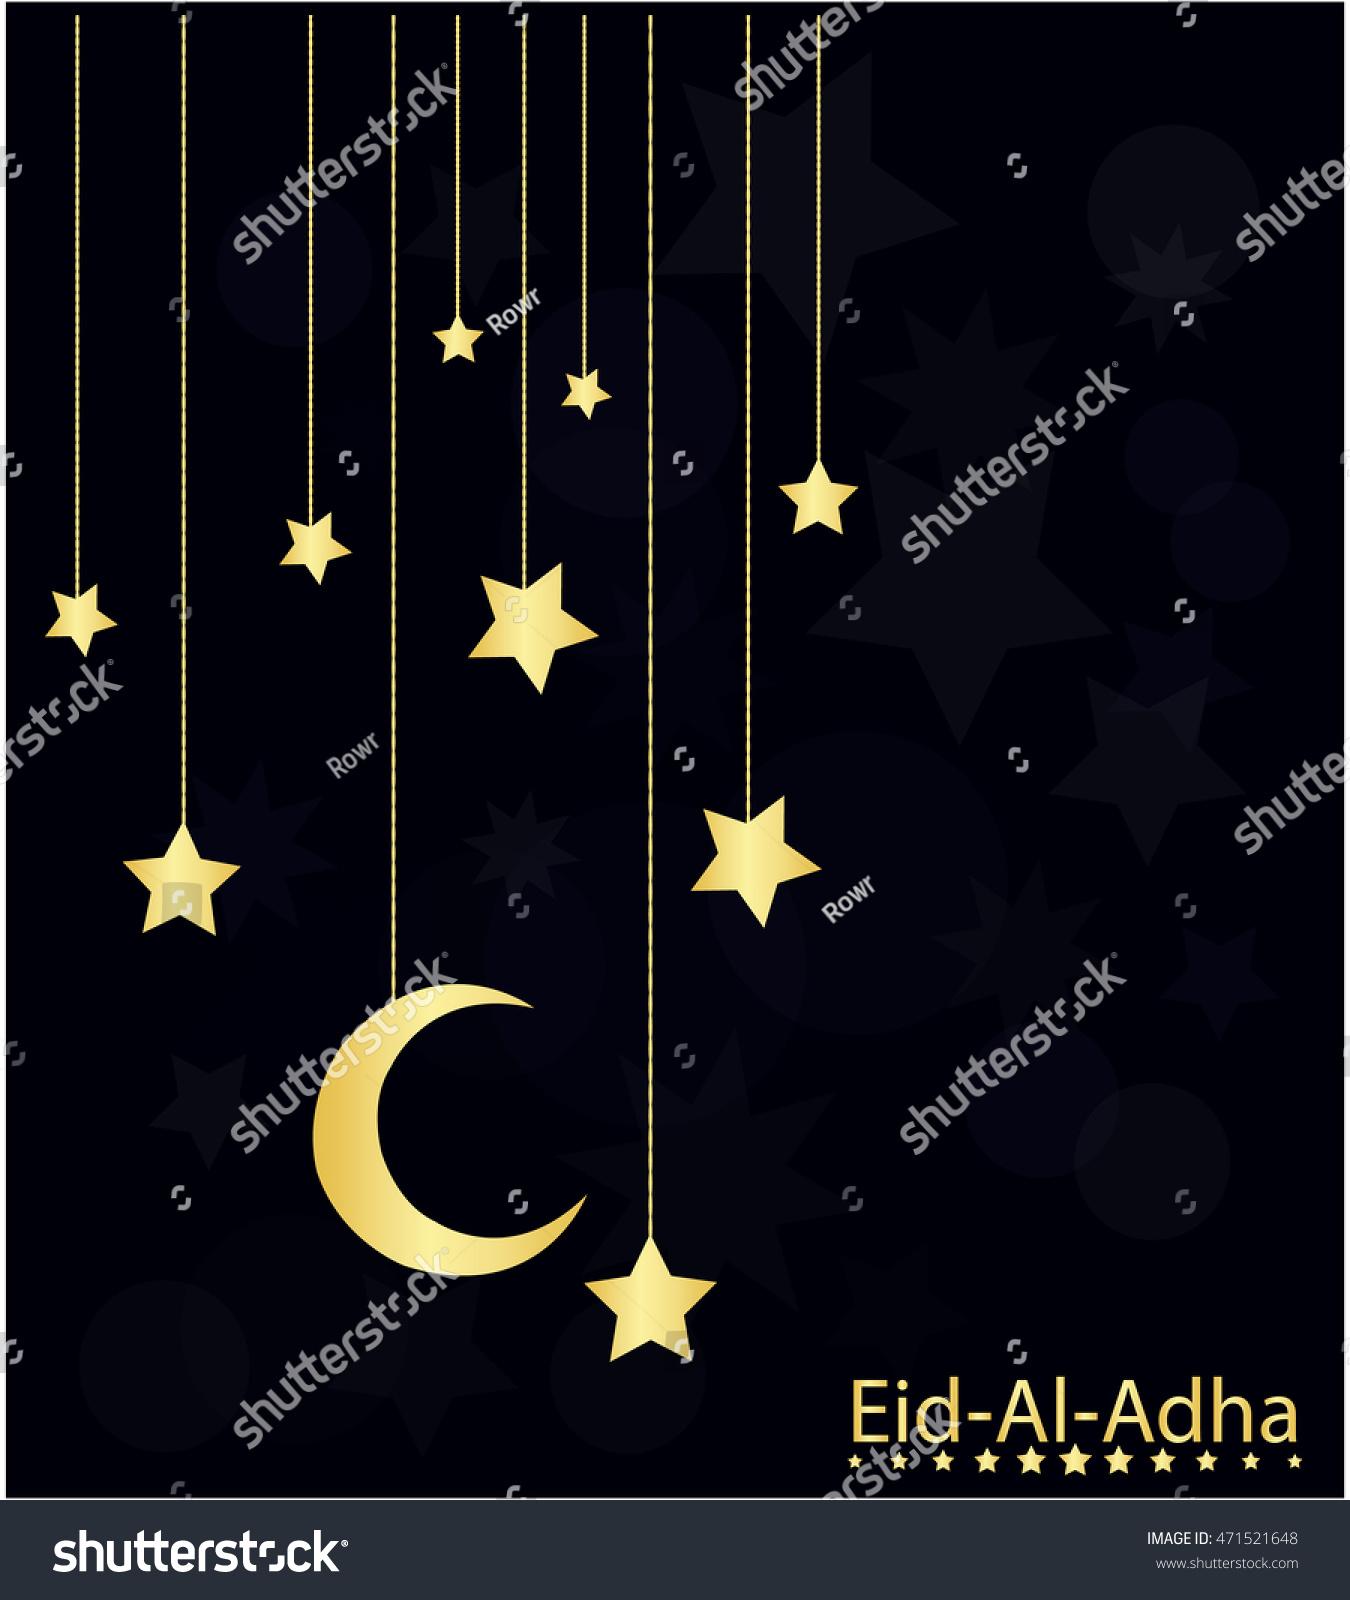 Eid al adha greeting card background stock vector 471521648 eid al adha greeting card or background vector illustration kristyandbryce Images